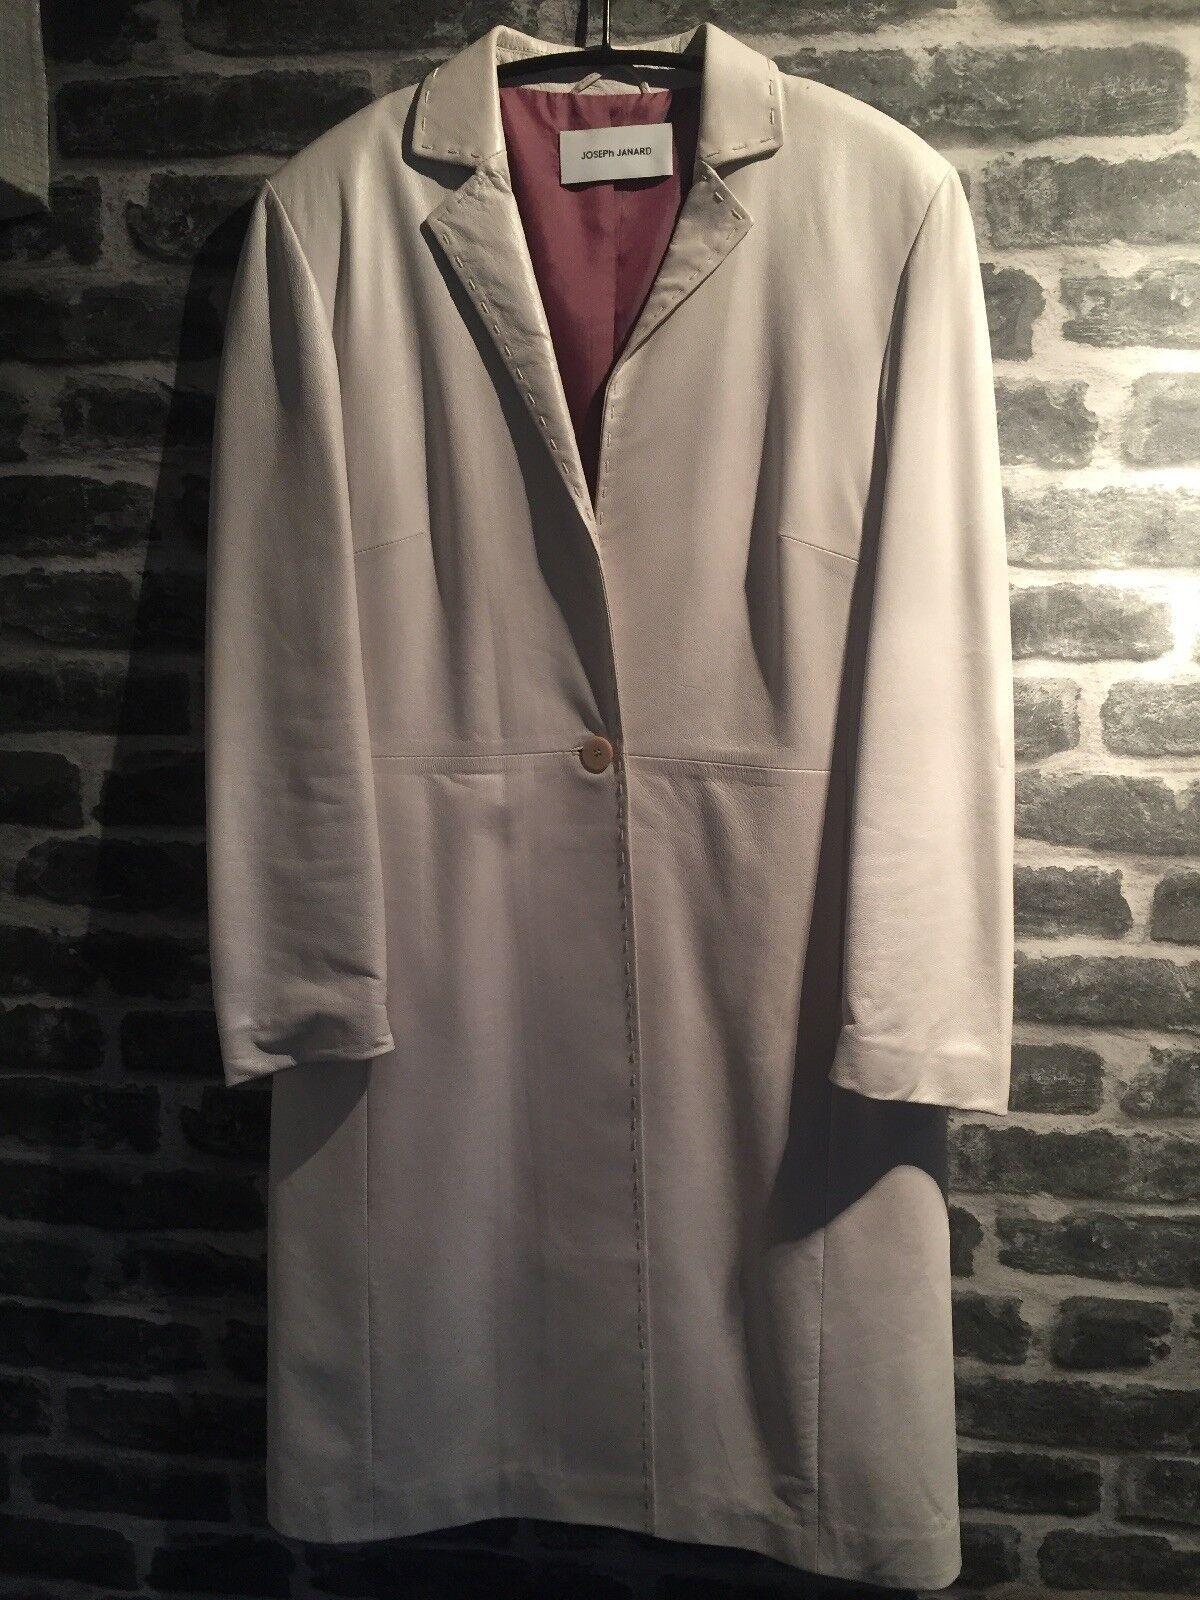 Joseph Janard White Leather Suit- Ladies Size 12